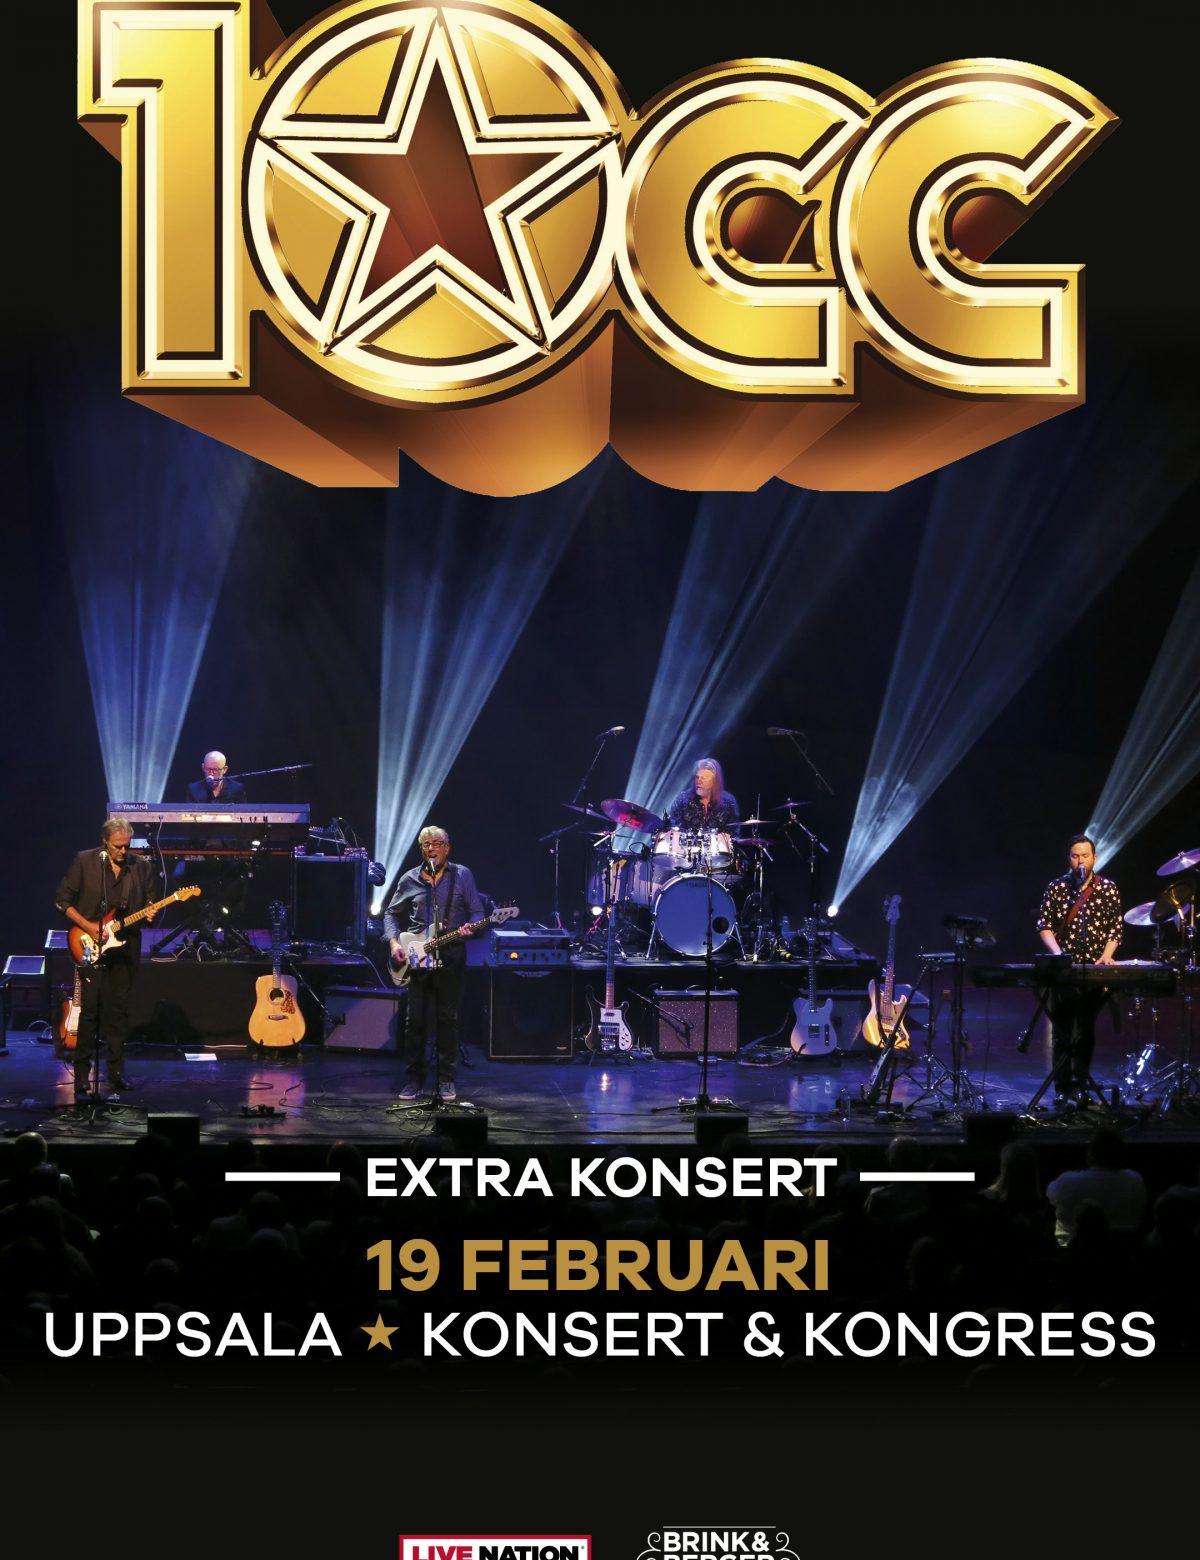 10cc Uppsala Konsert & Kongress